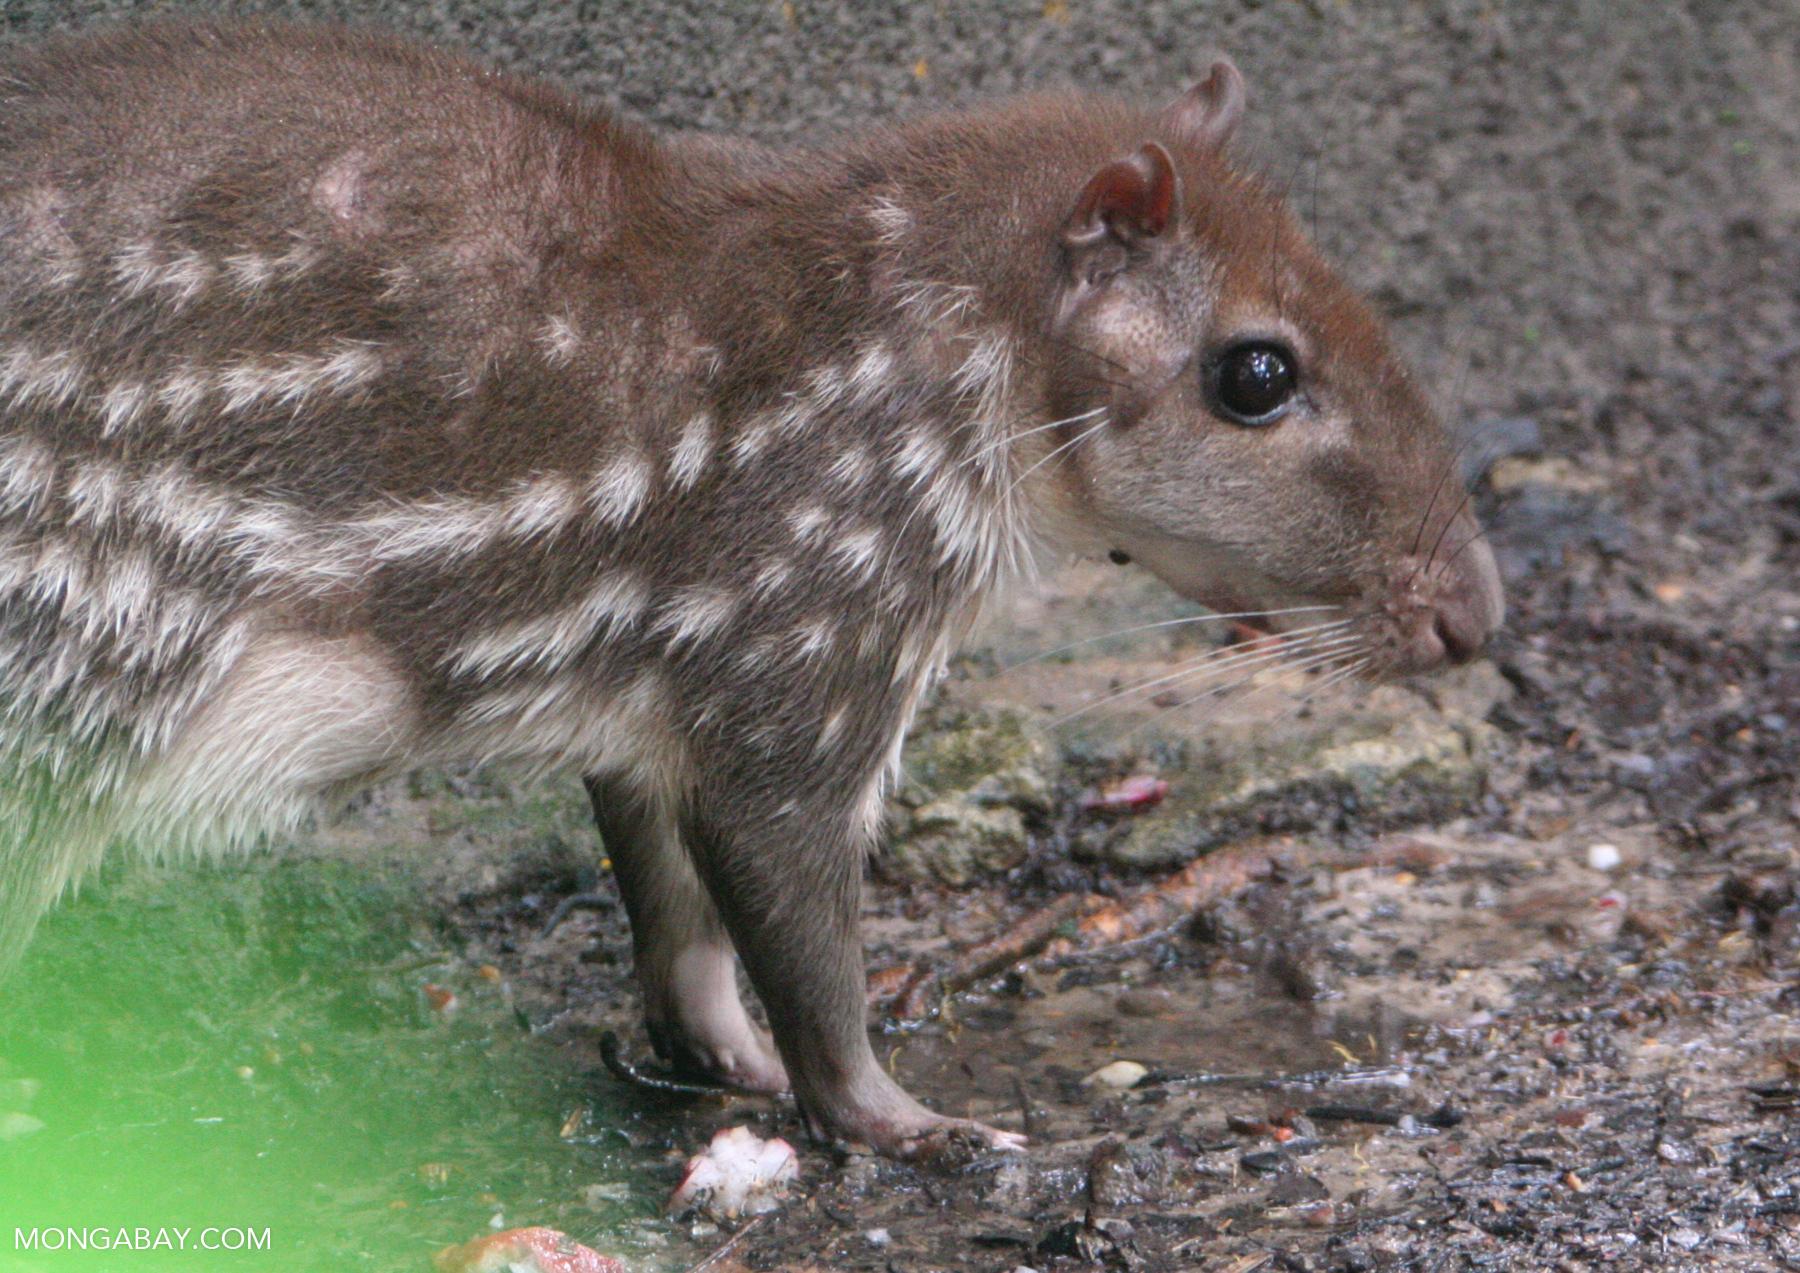 Borugo (Agouti taczanowskii), a large Amazon rainforest rodent.